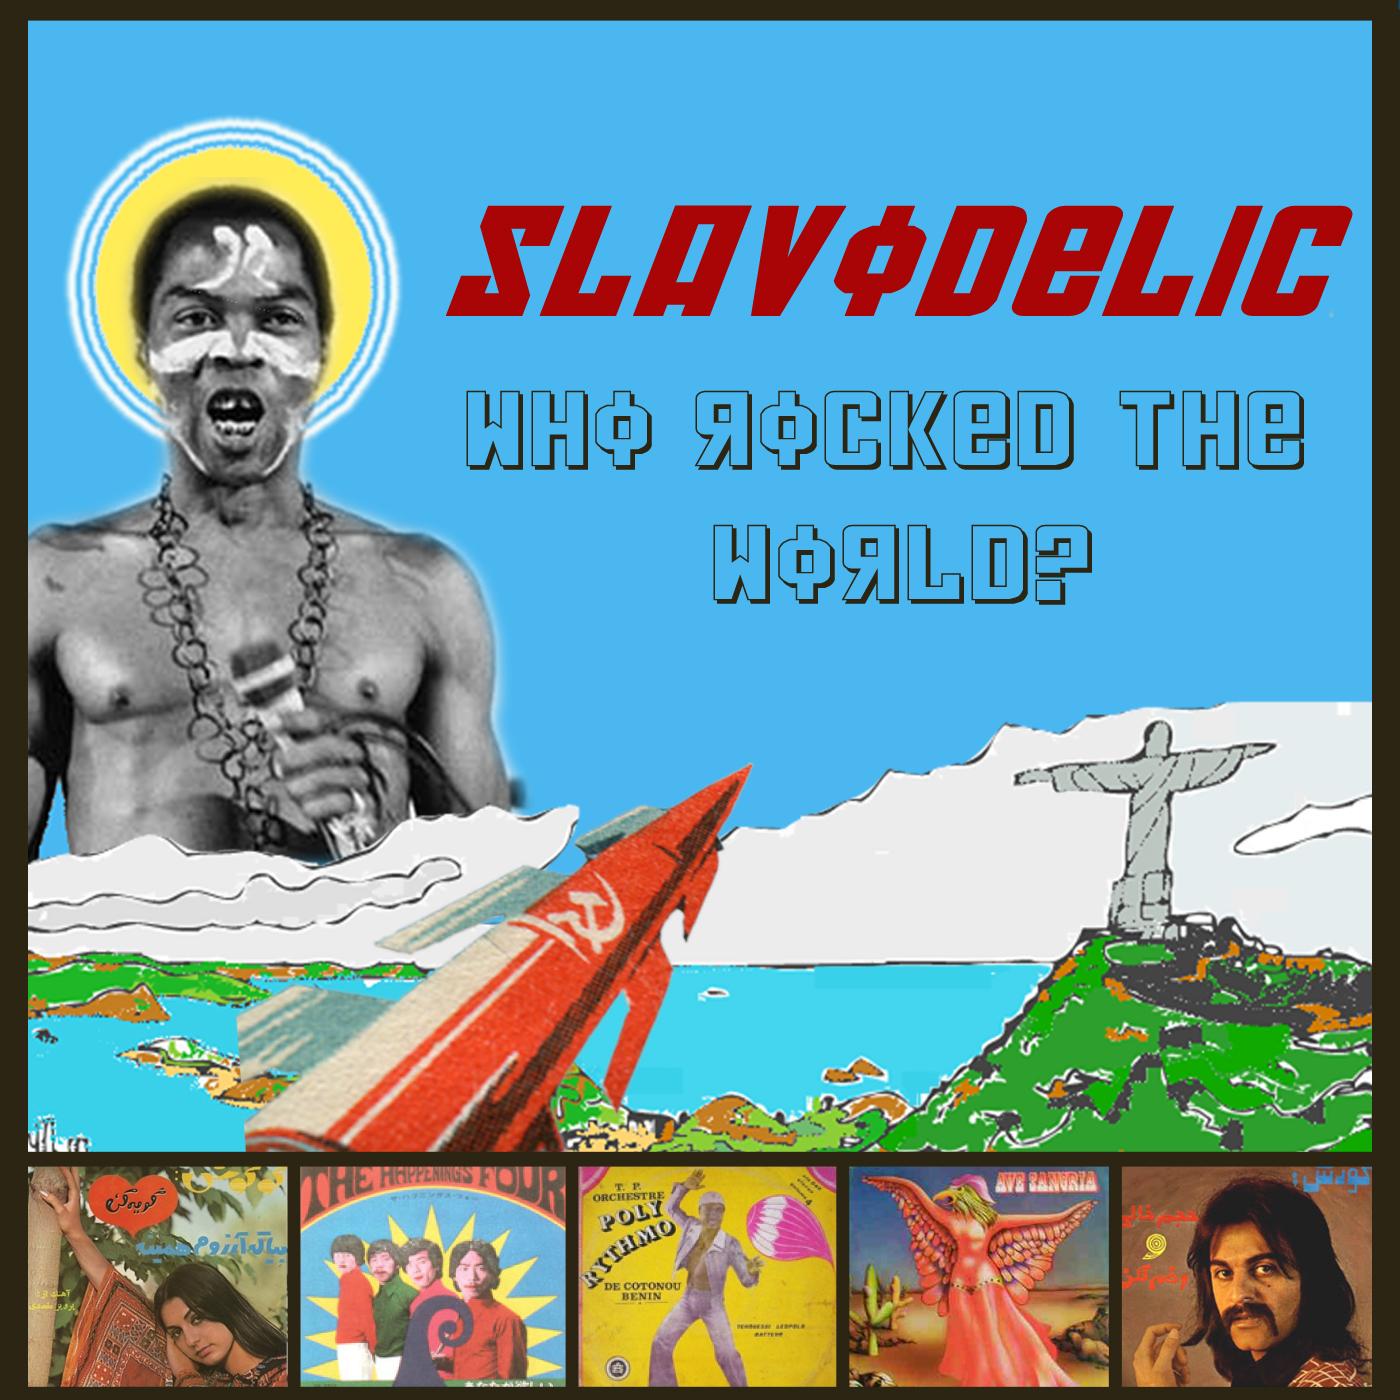 >> Slavodelic Podcast